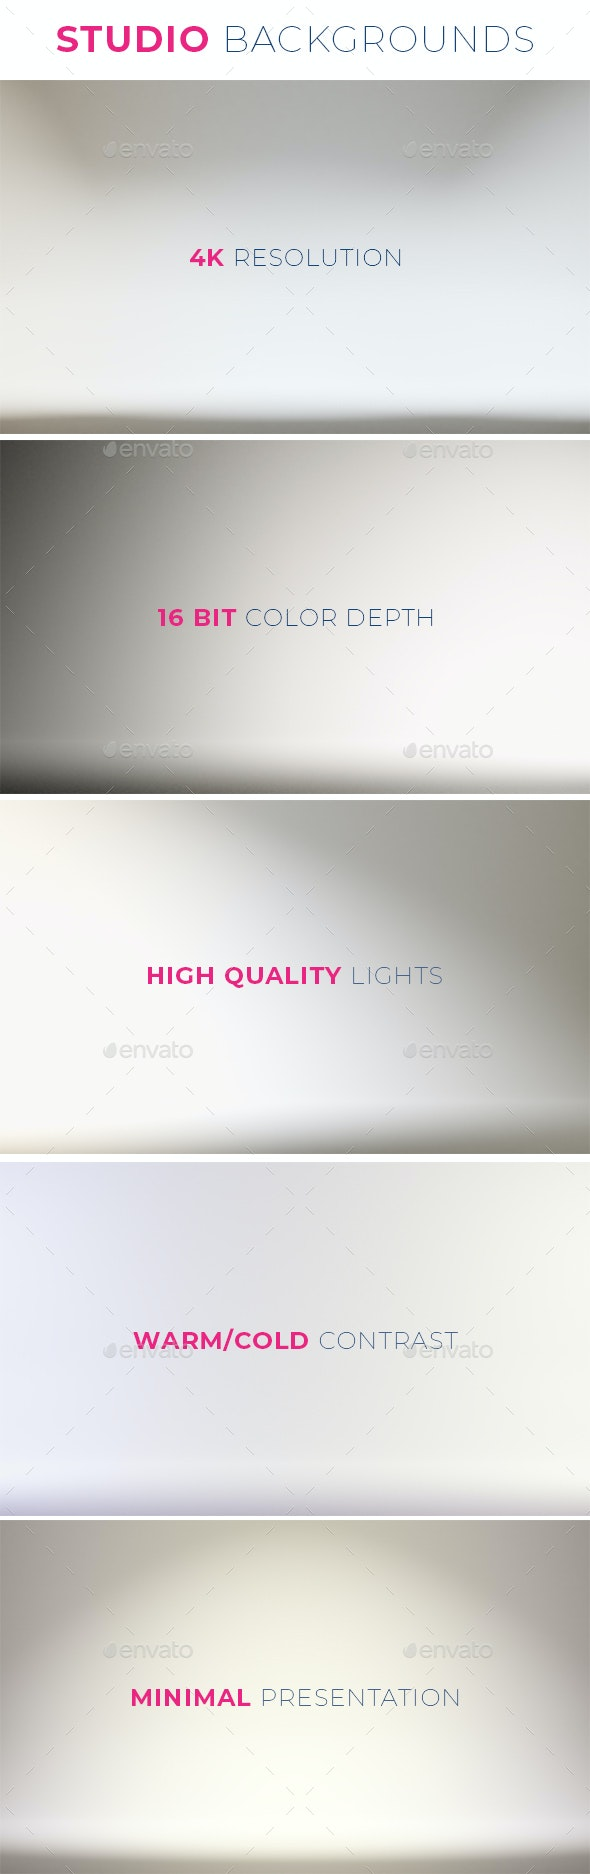 Studio Backgrounds - Backgrounds Graphics